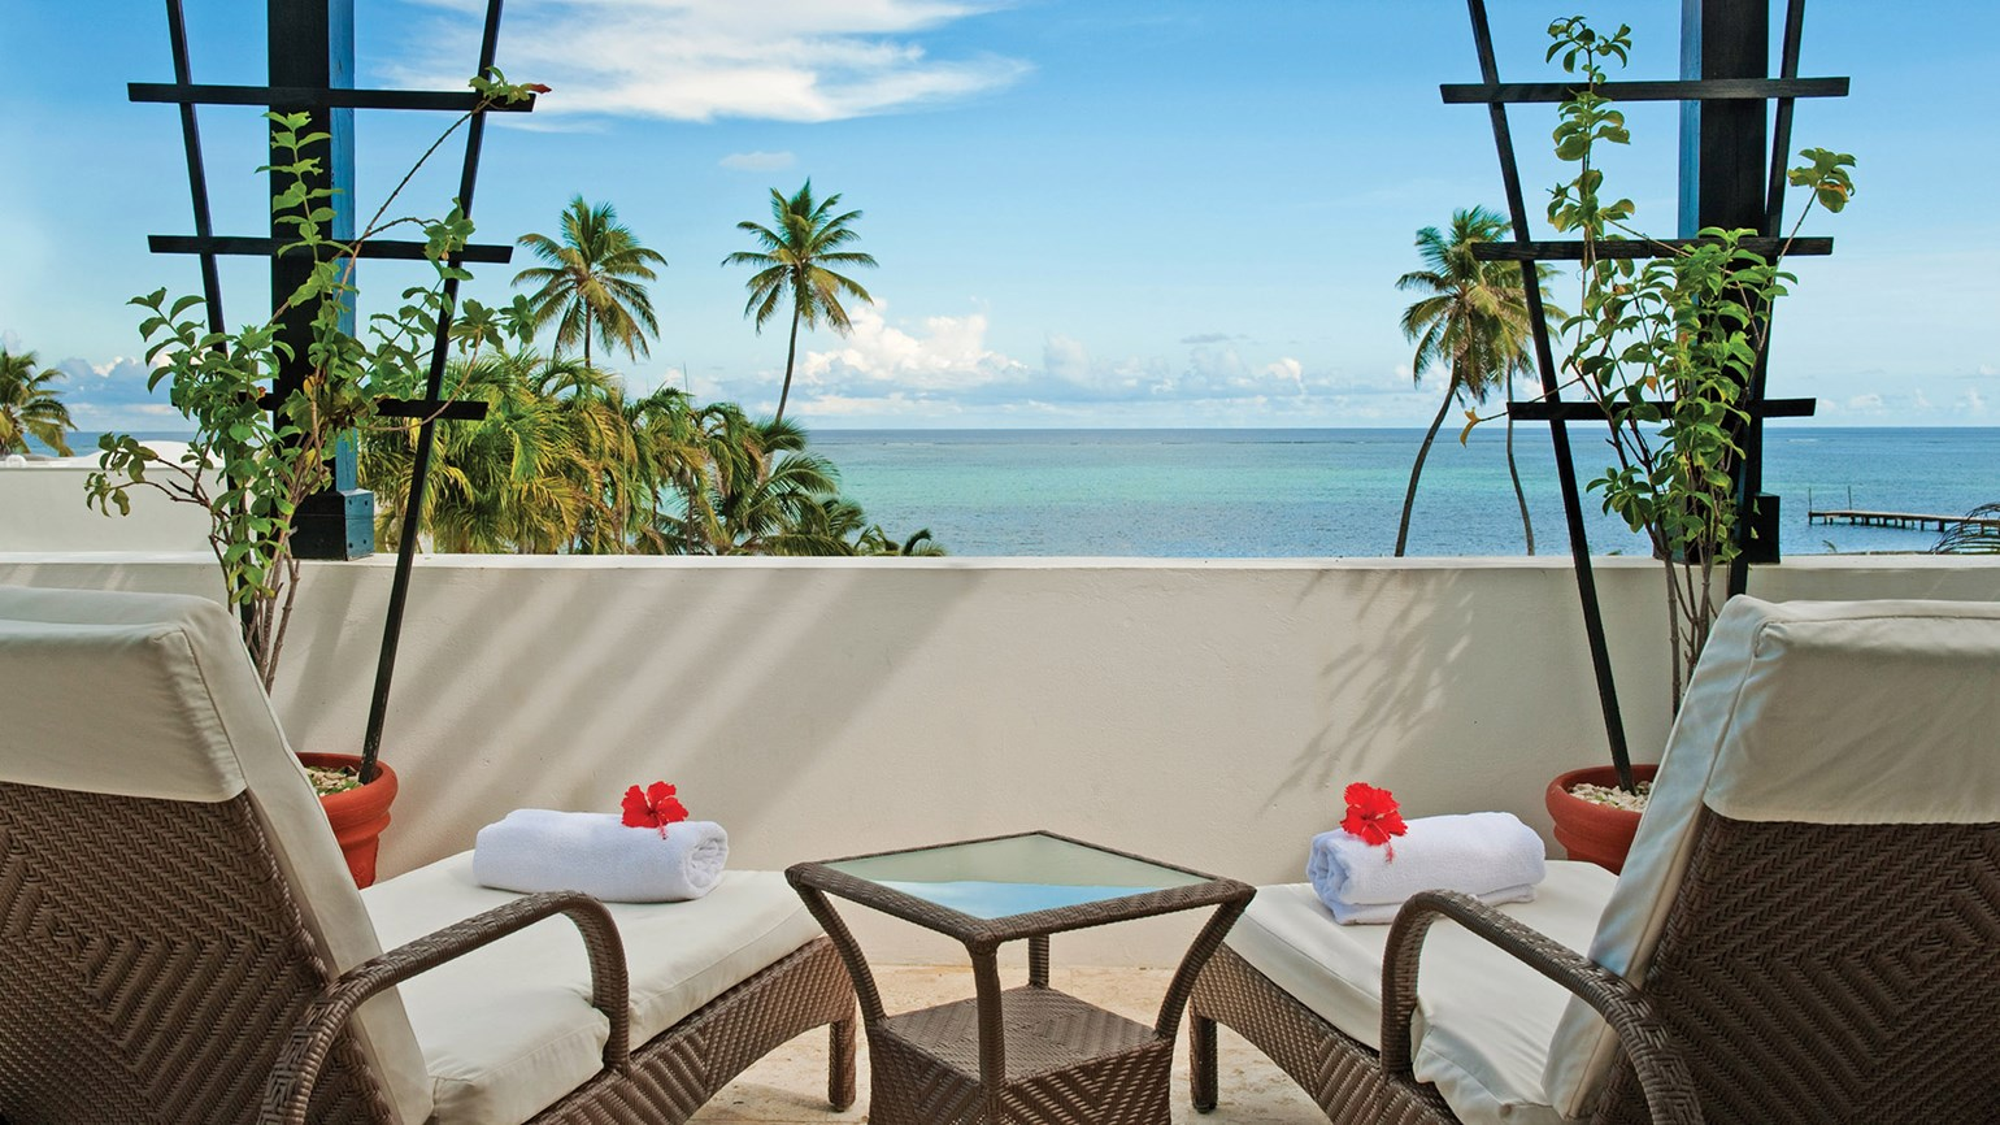 Timeshare Resorts - List of Timeshare Companies and ...